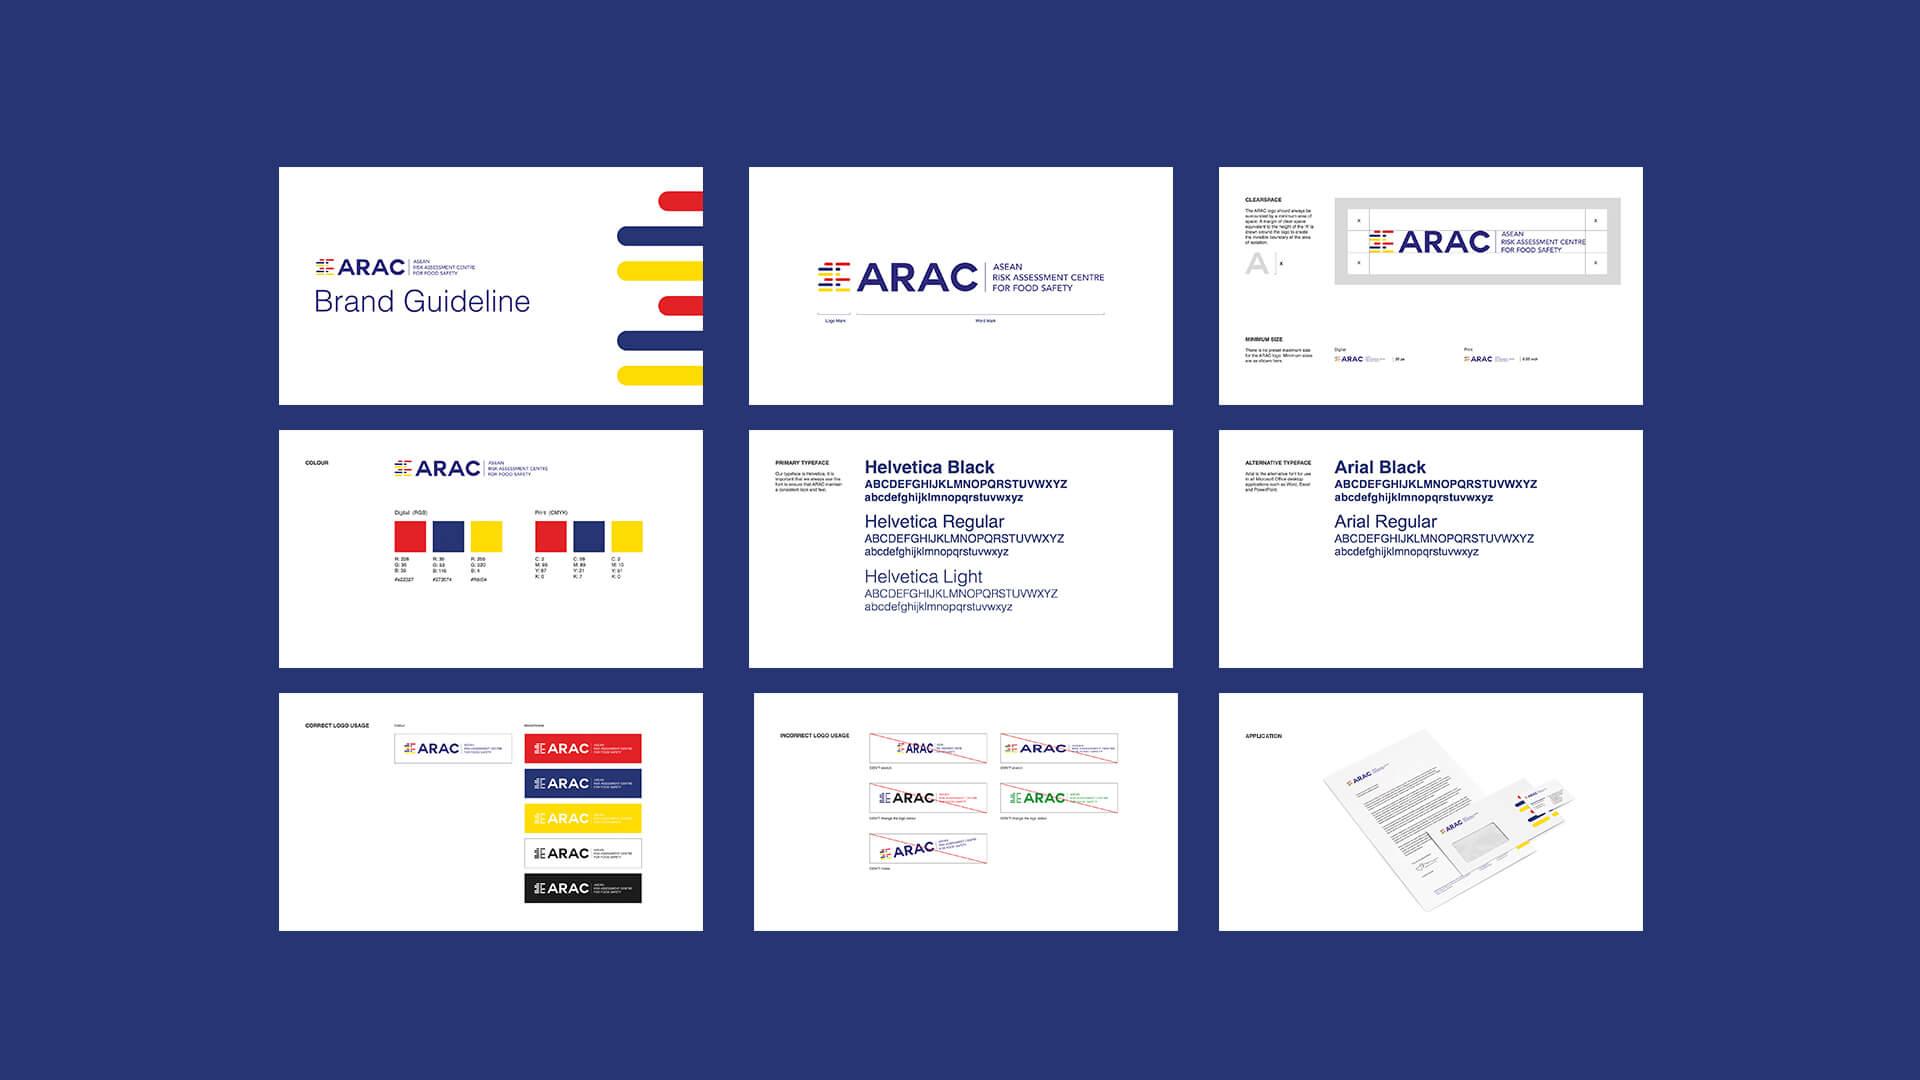 arac-brand-guideline2